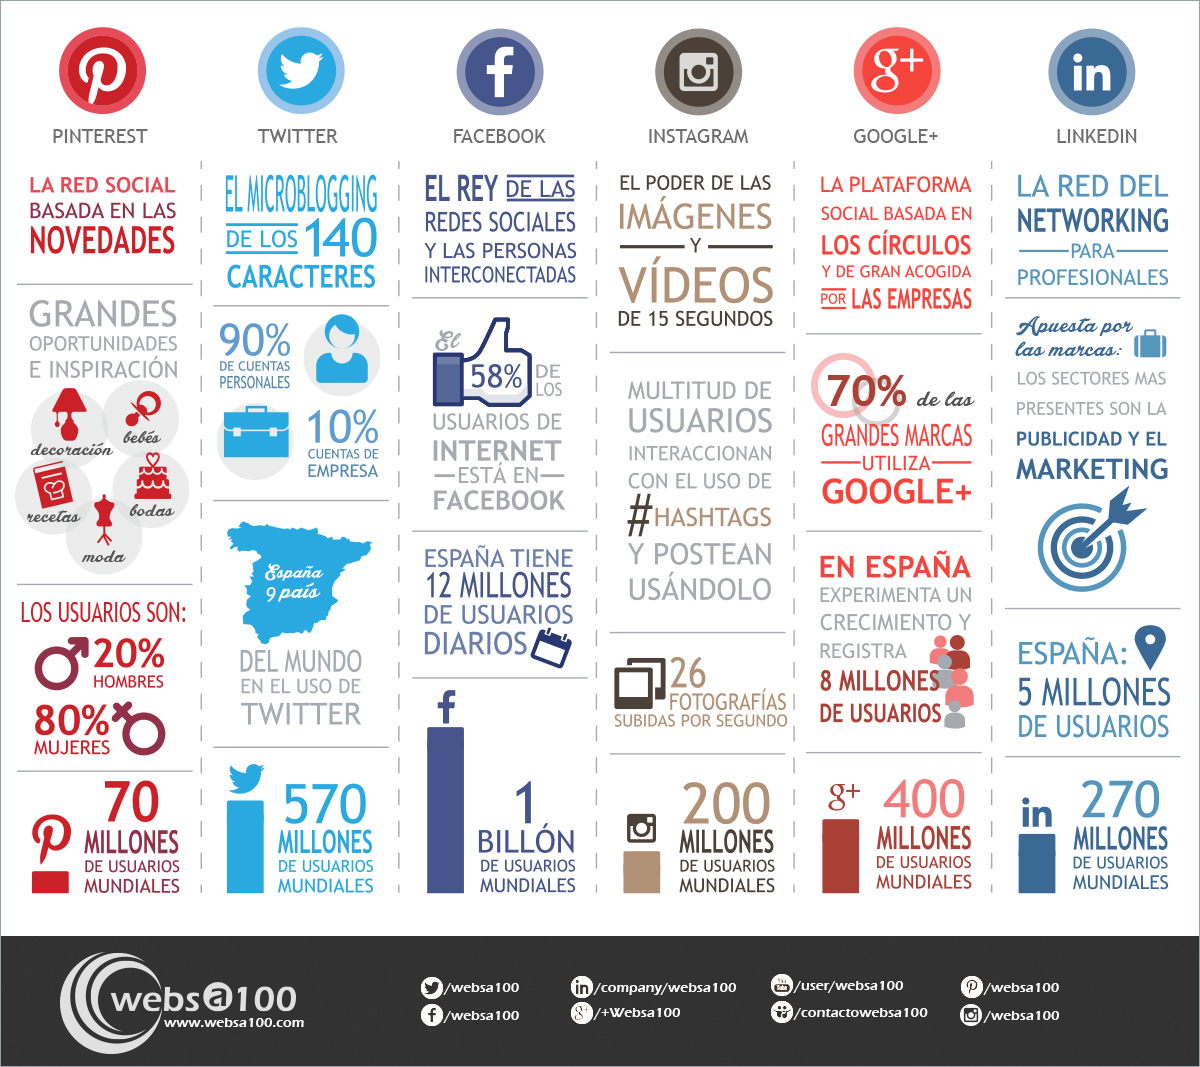 65 Ideas De Redes Sociales Redes Sociales Socialismo Infografia